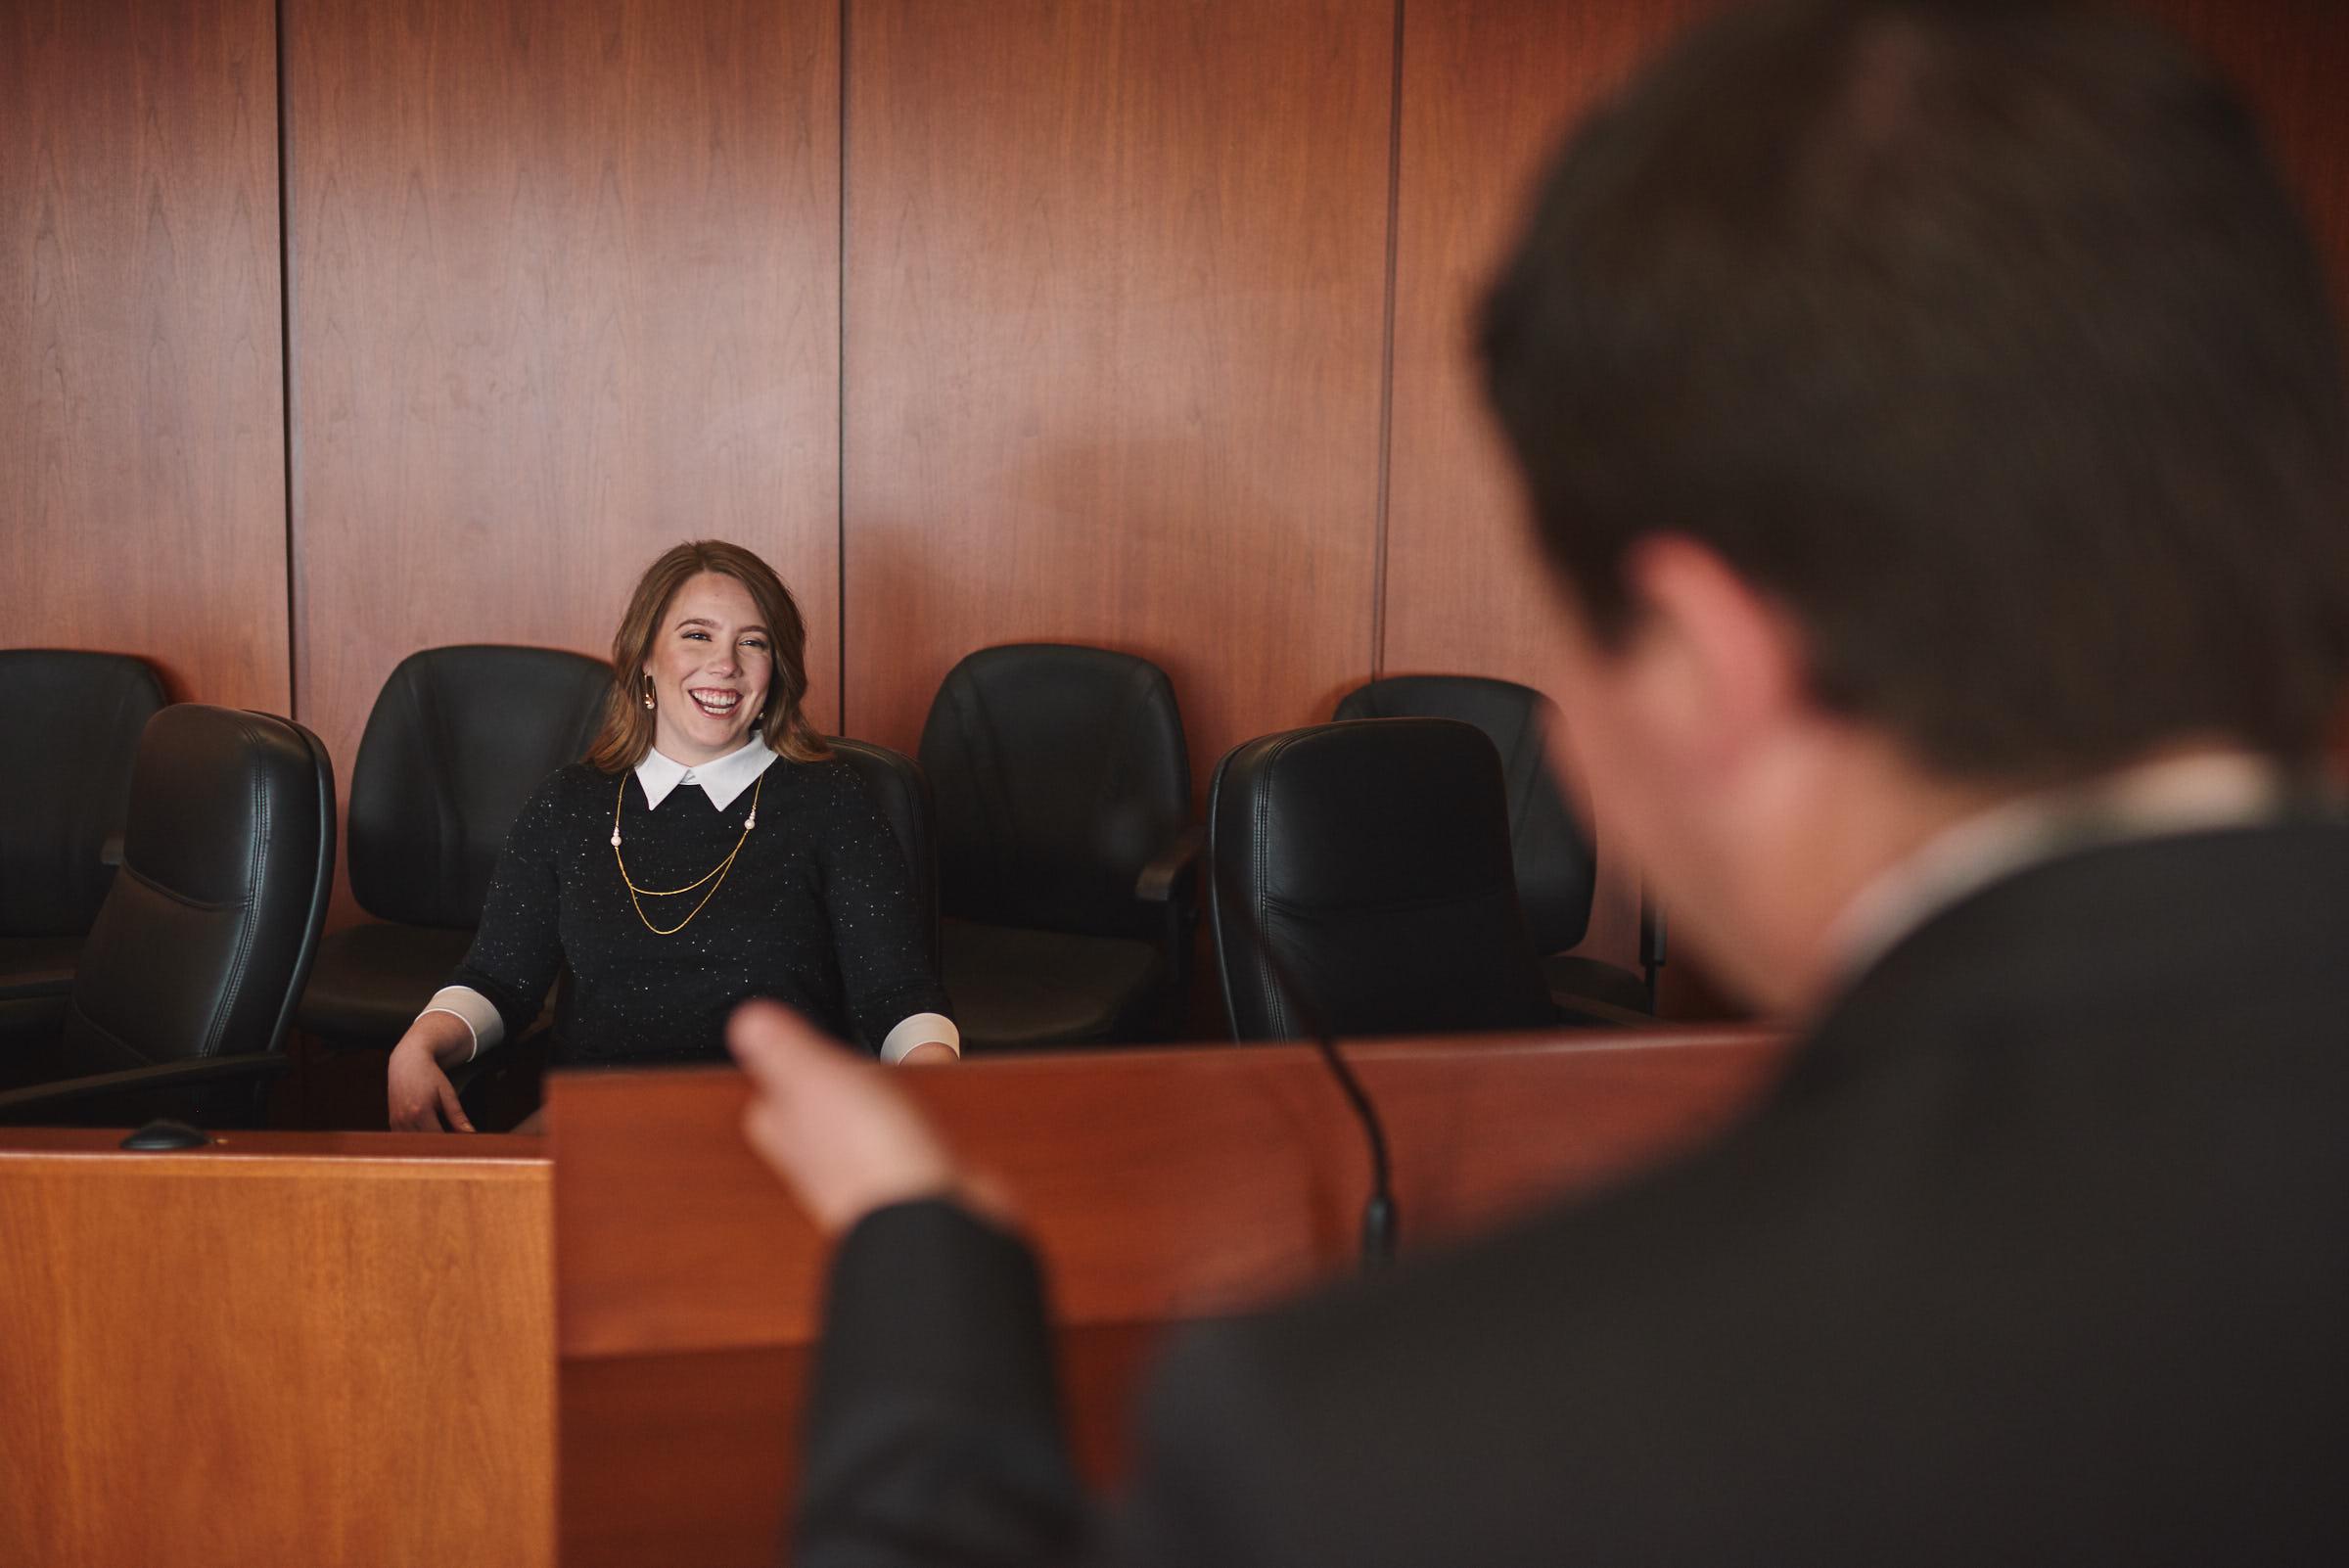 Fun loving portrait in jury box